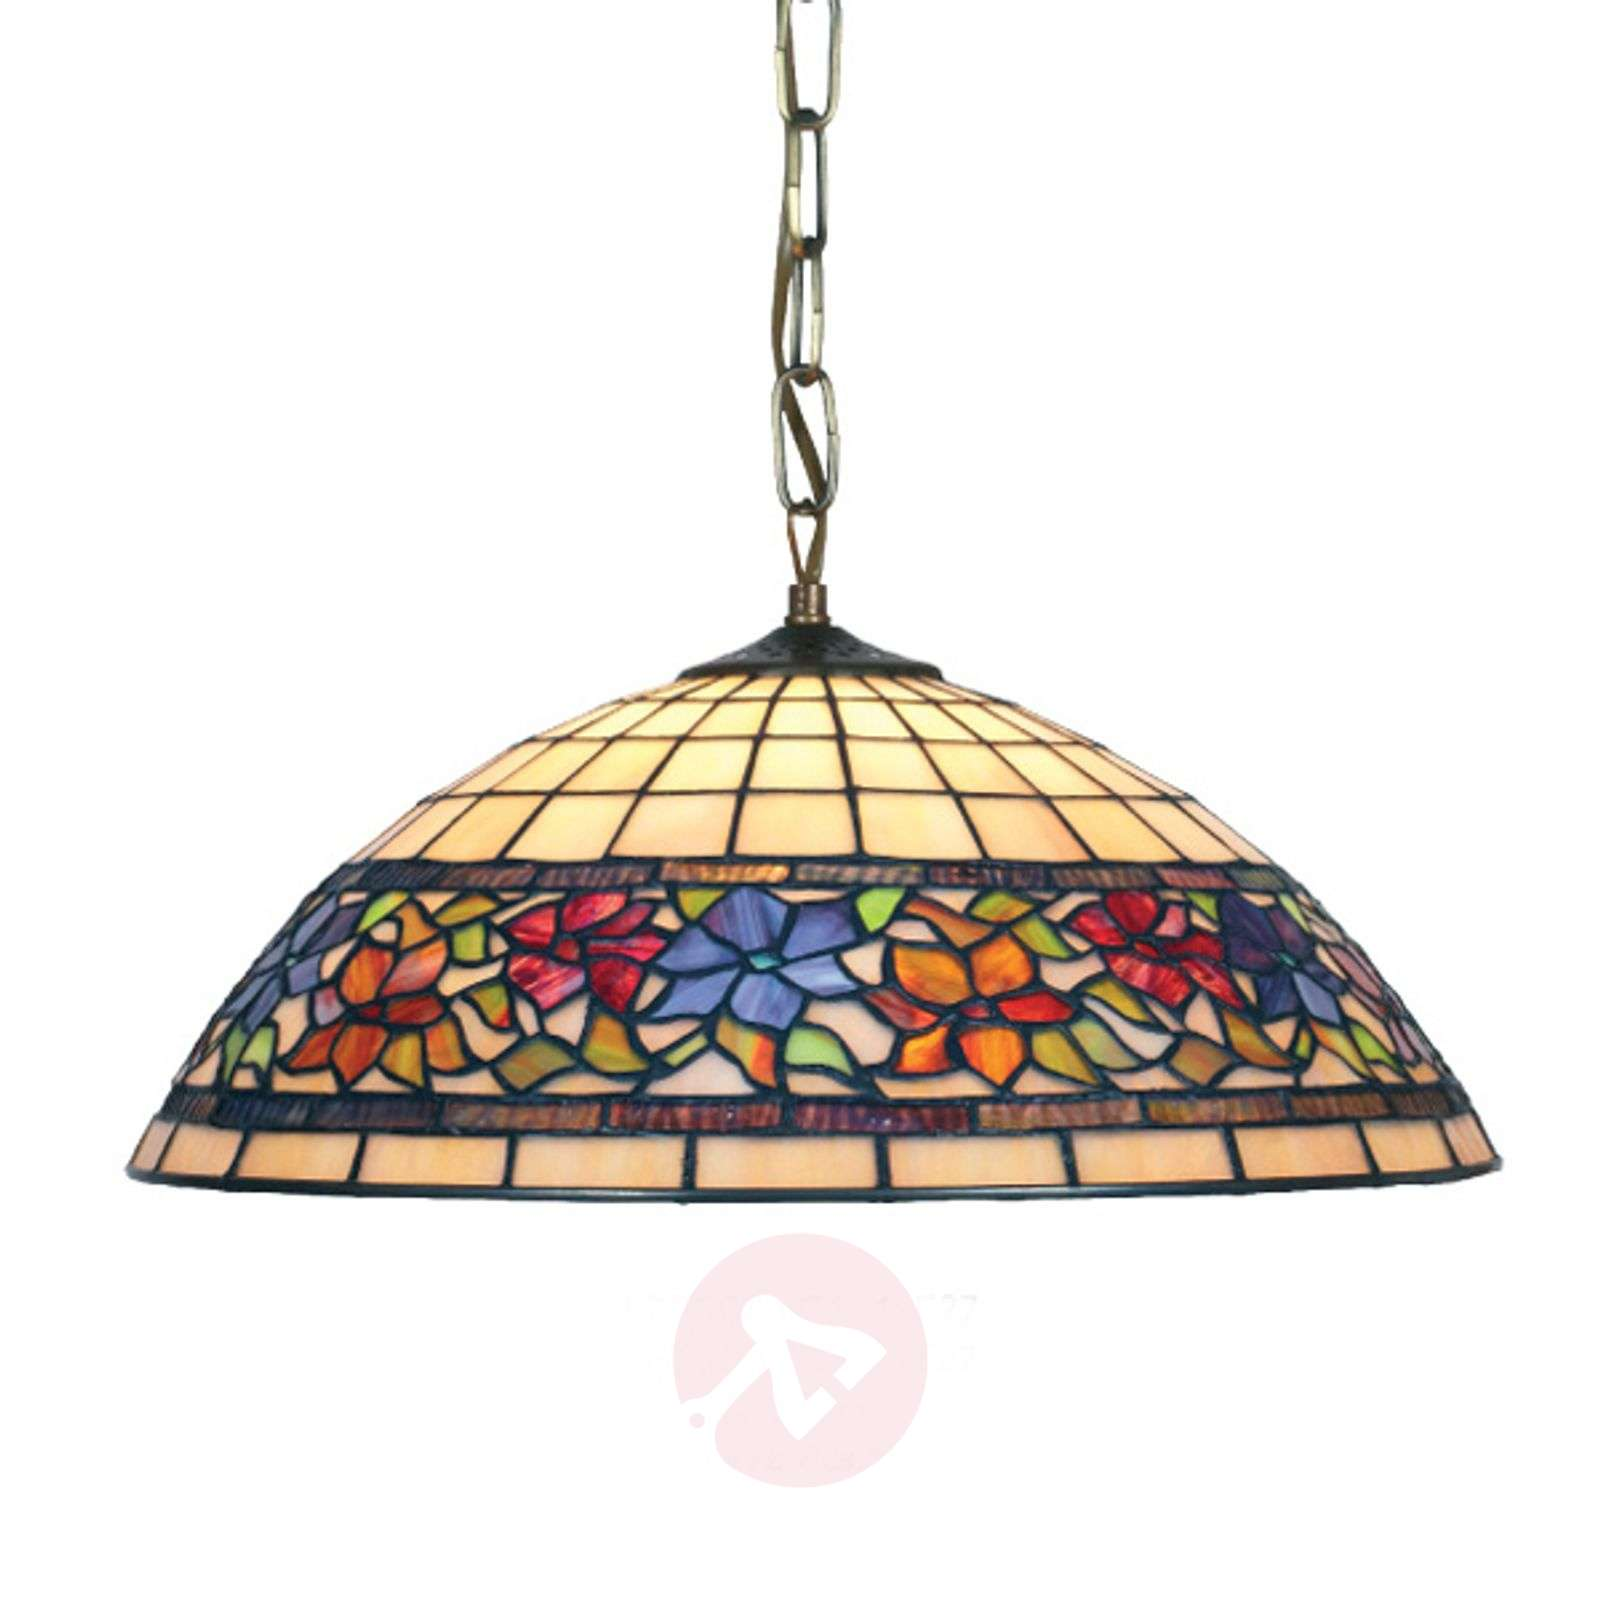 Hanging light Flora, Tiffany-style-1032126X-01